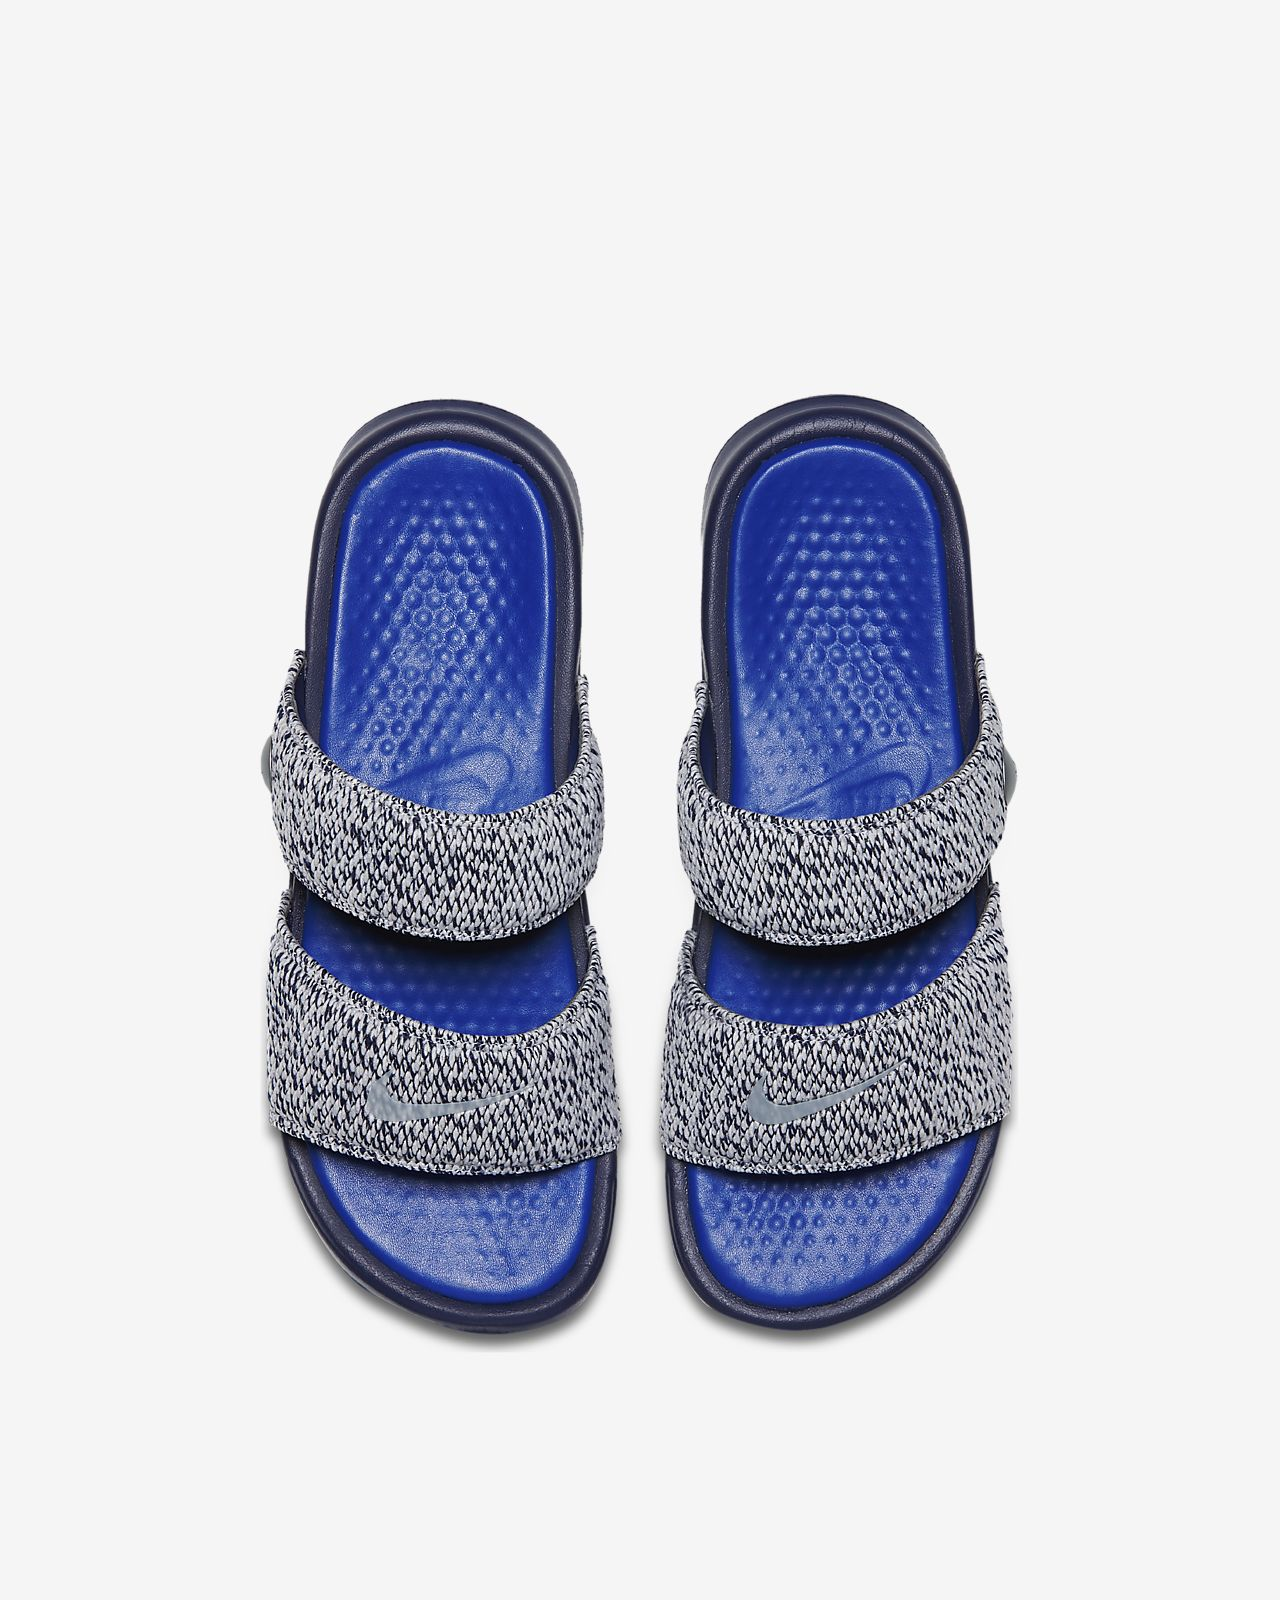 885368d85a78 Nike Benassi Duo Ultra x Pigalle 男子拖鞋耐克官网中国